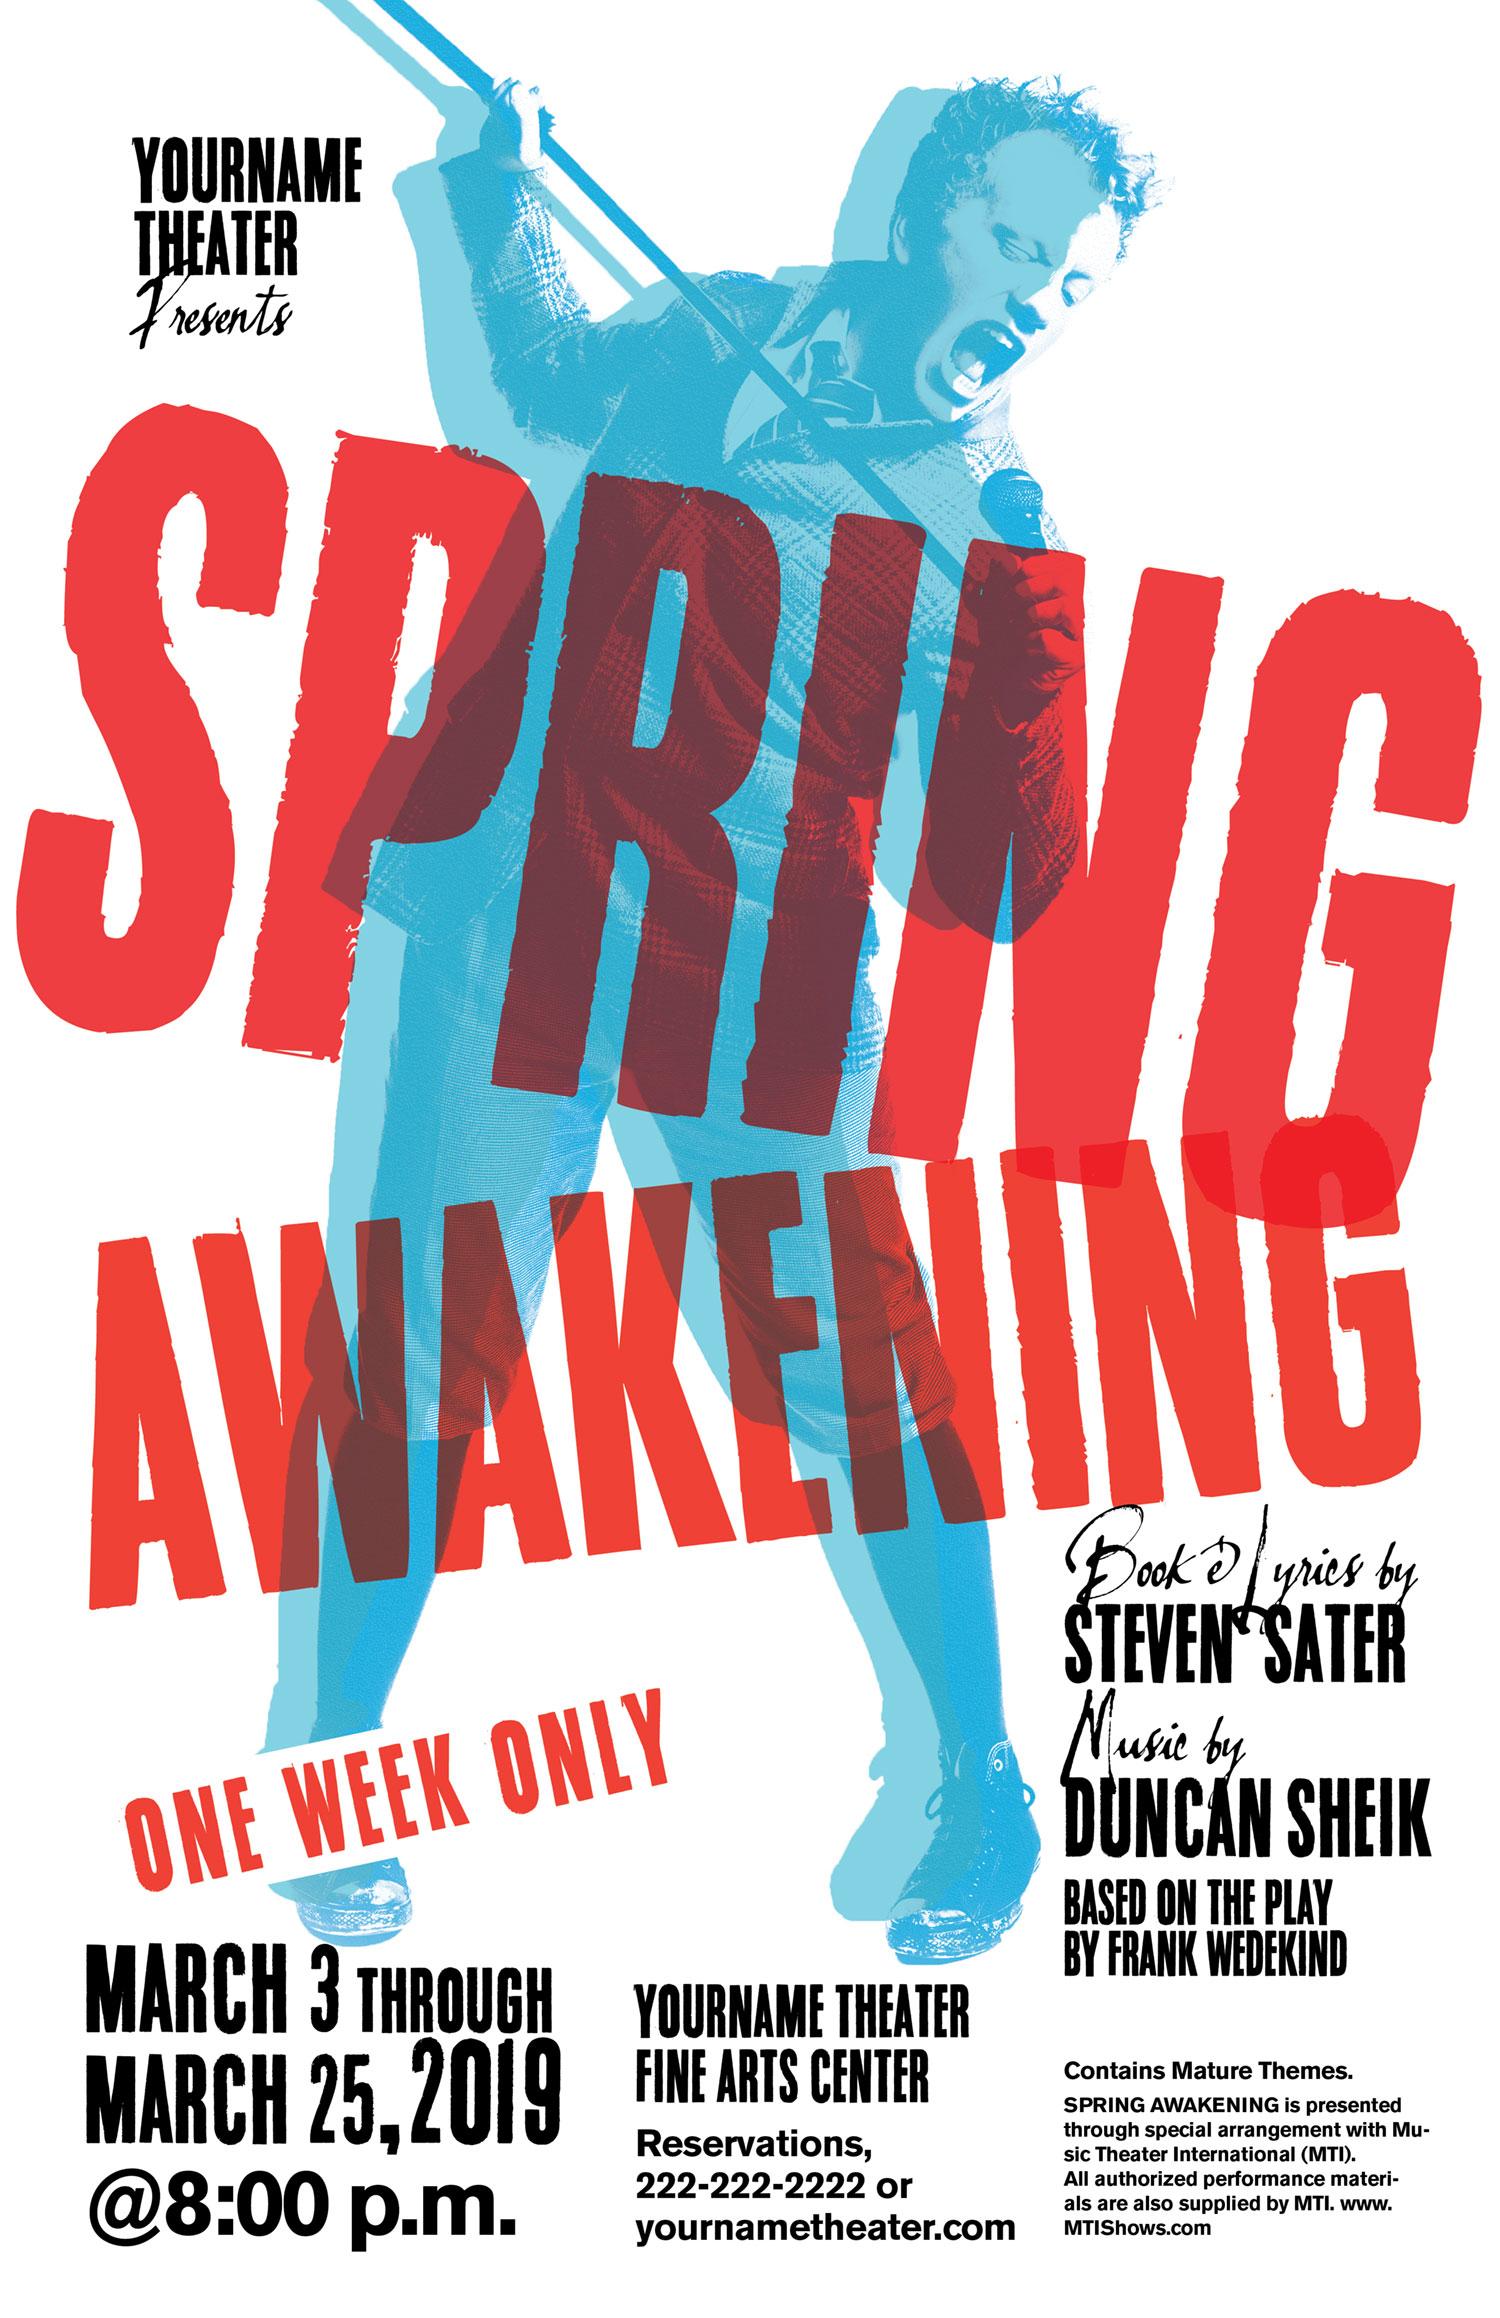 Drama -Queen-Graphics-Theatre Branding-SPRING-AWAKENING-2019.jpg